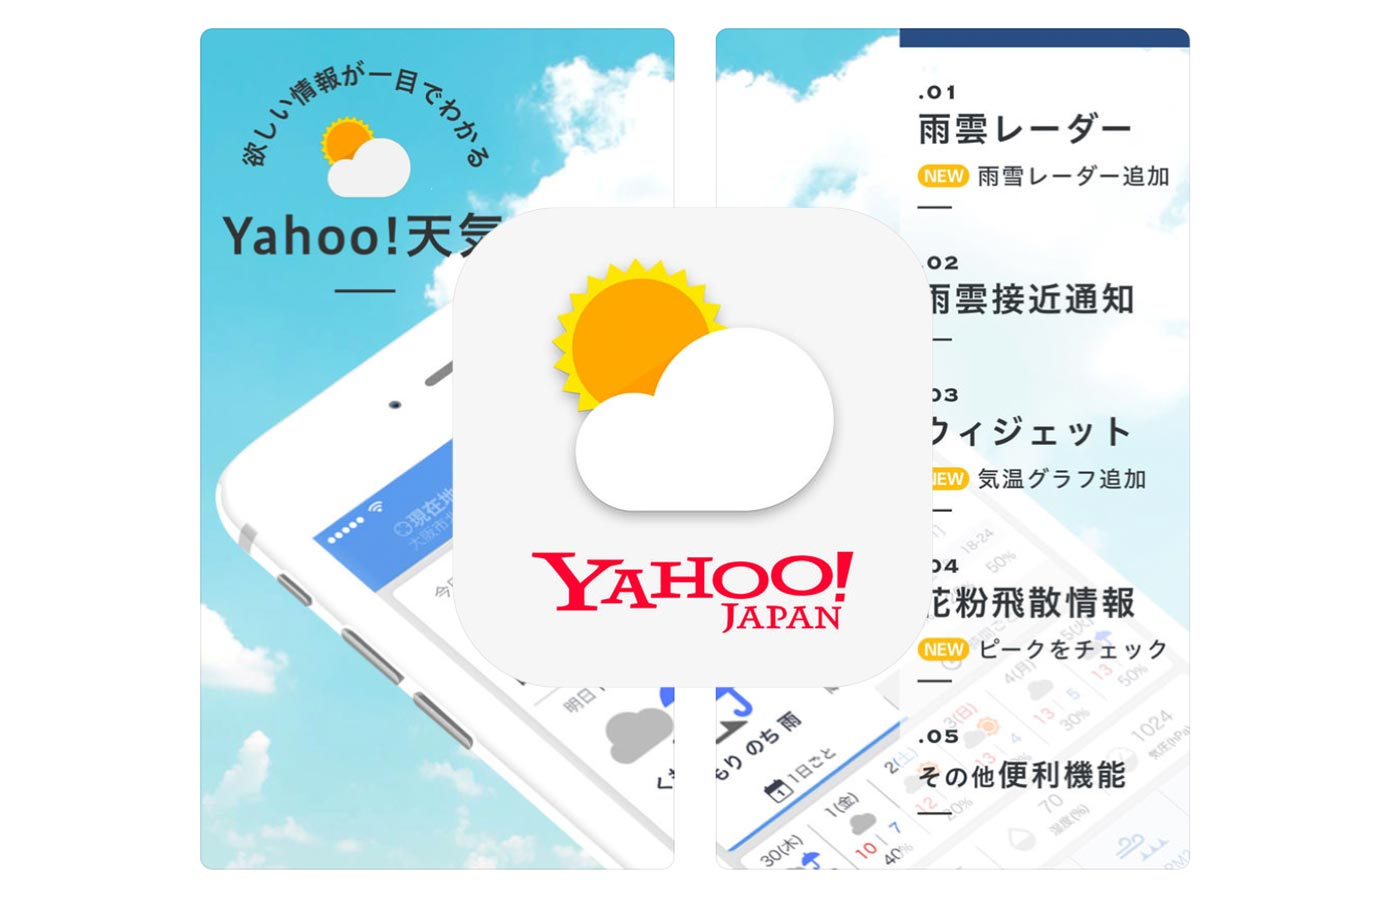 iOSアプリ「Yahoo!天気」をアップデート、今年も花粉情報を追加